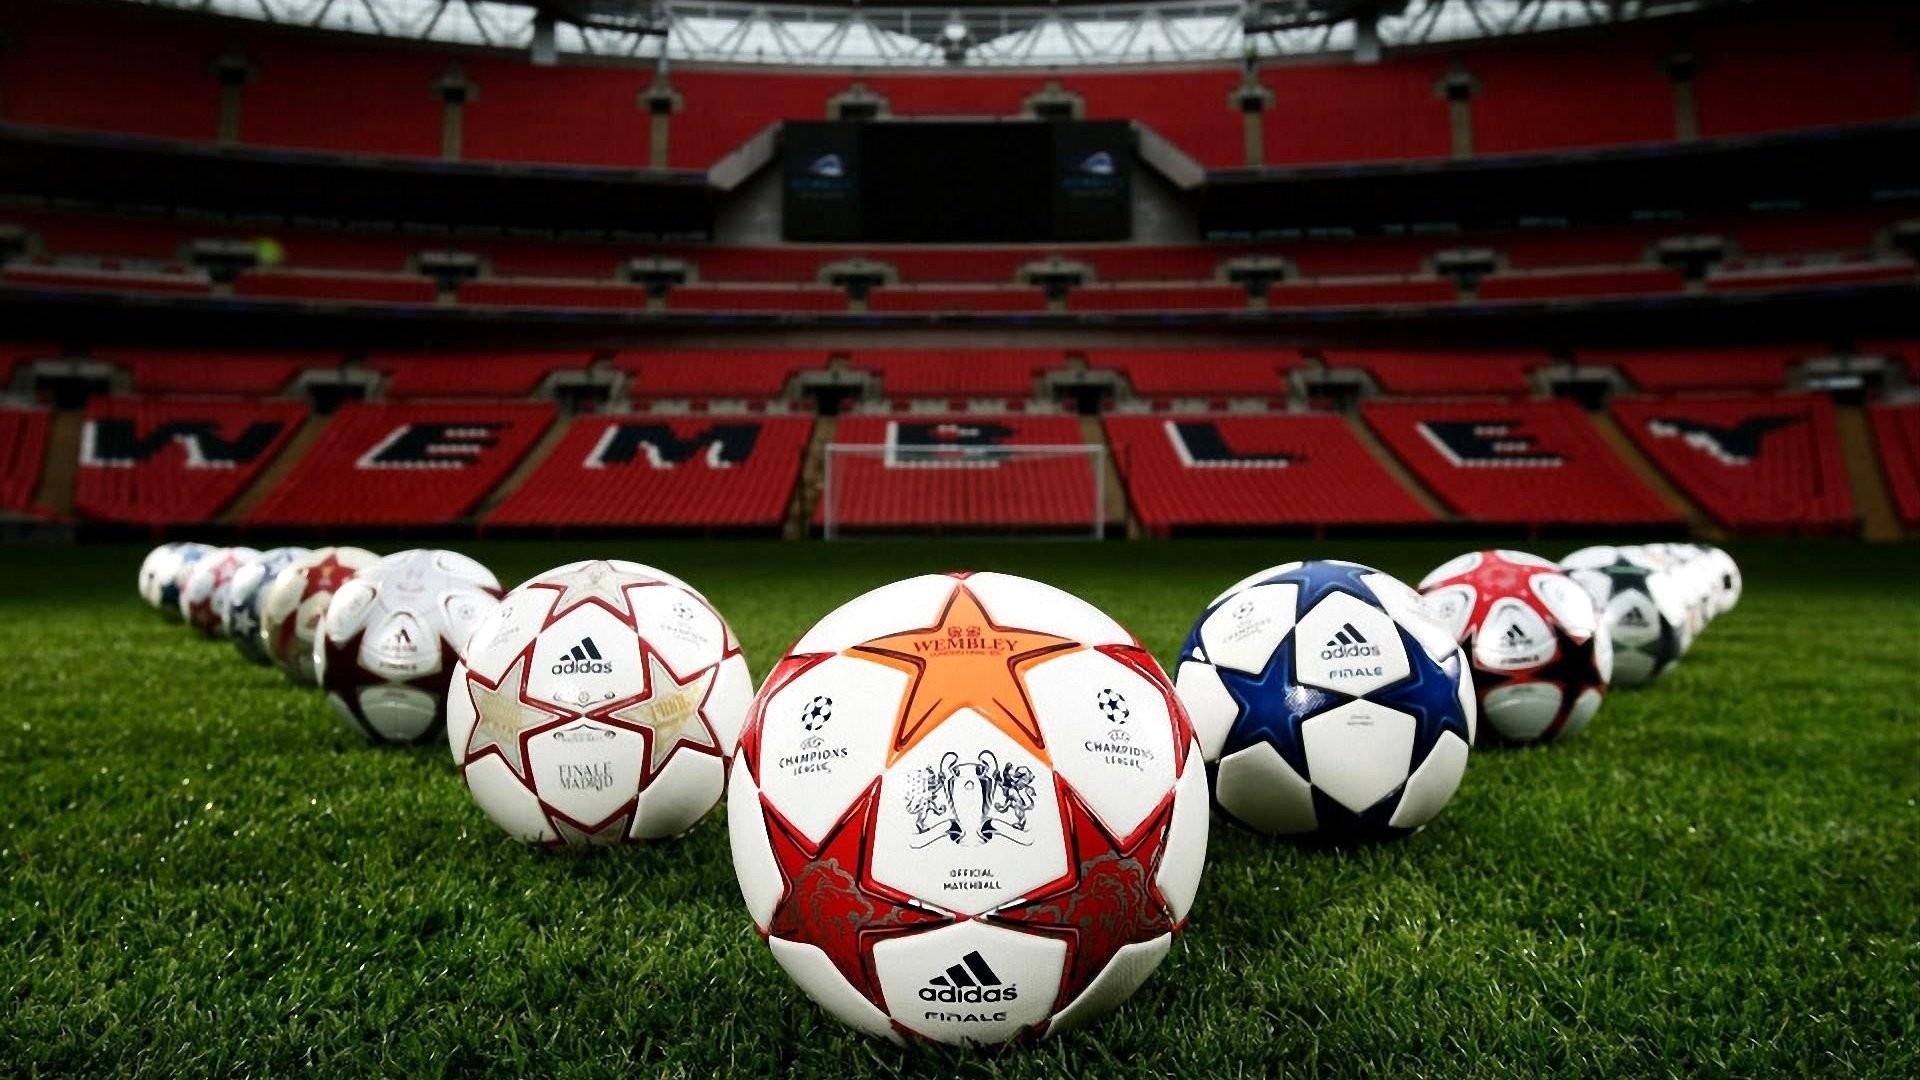 Fantastic Wallpaper Macbook Soccer - 604264-hd-soccer-wallpapers-1920x1080-macbook  Collection_713621.jpg